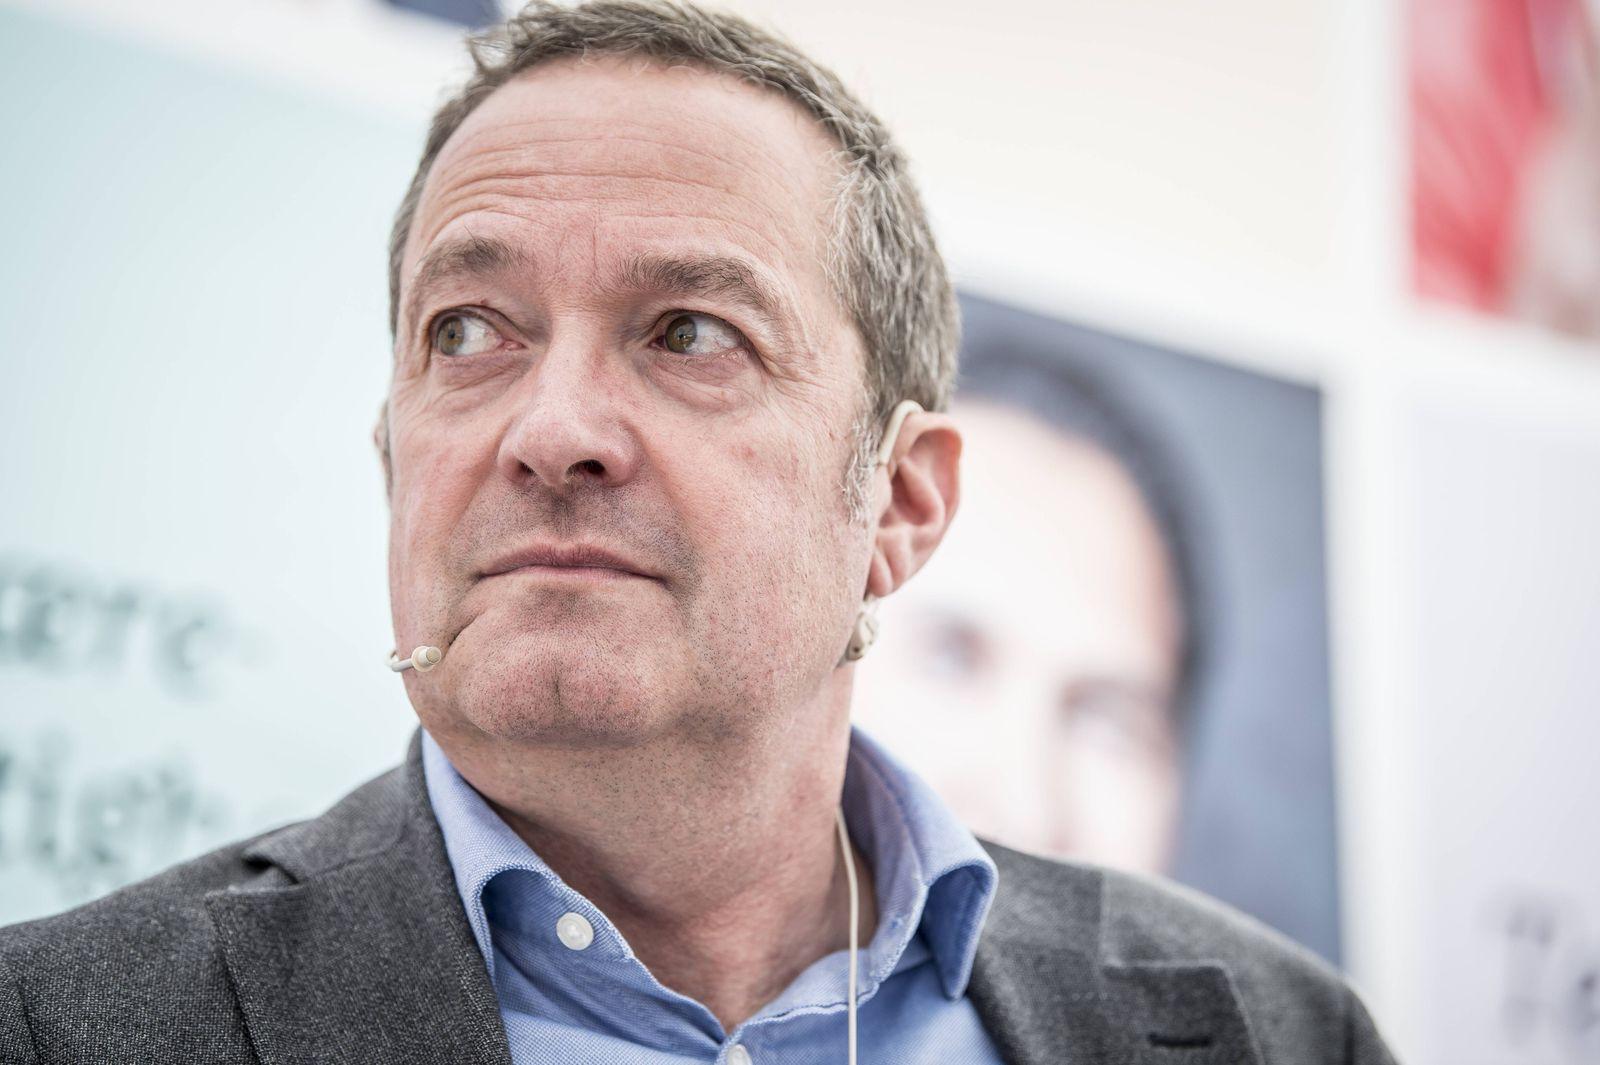 Chris Vogelzang administrerende direktoer i Danske Bank i Allinge paa Bornholm under Folkemoedet 201